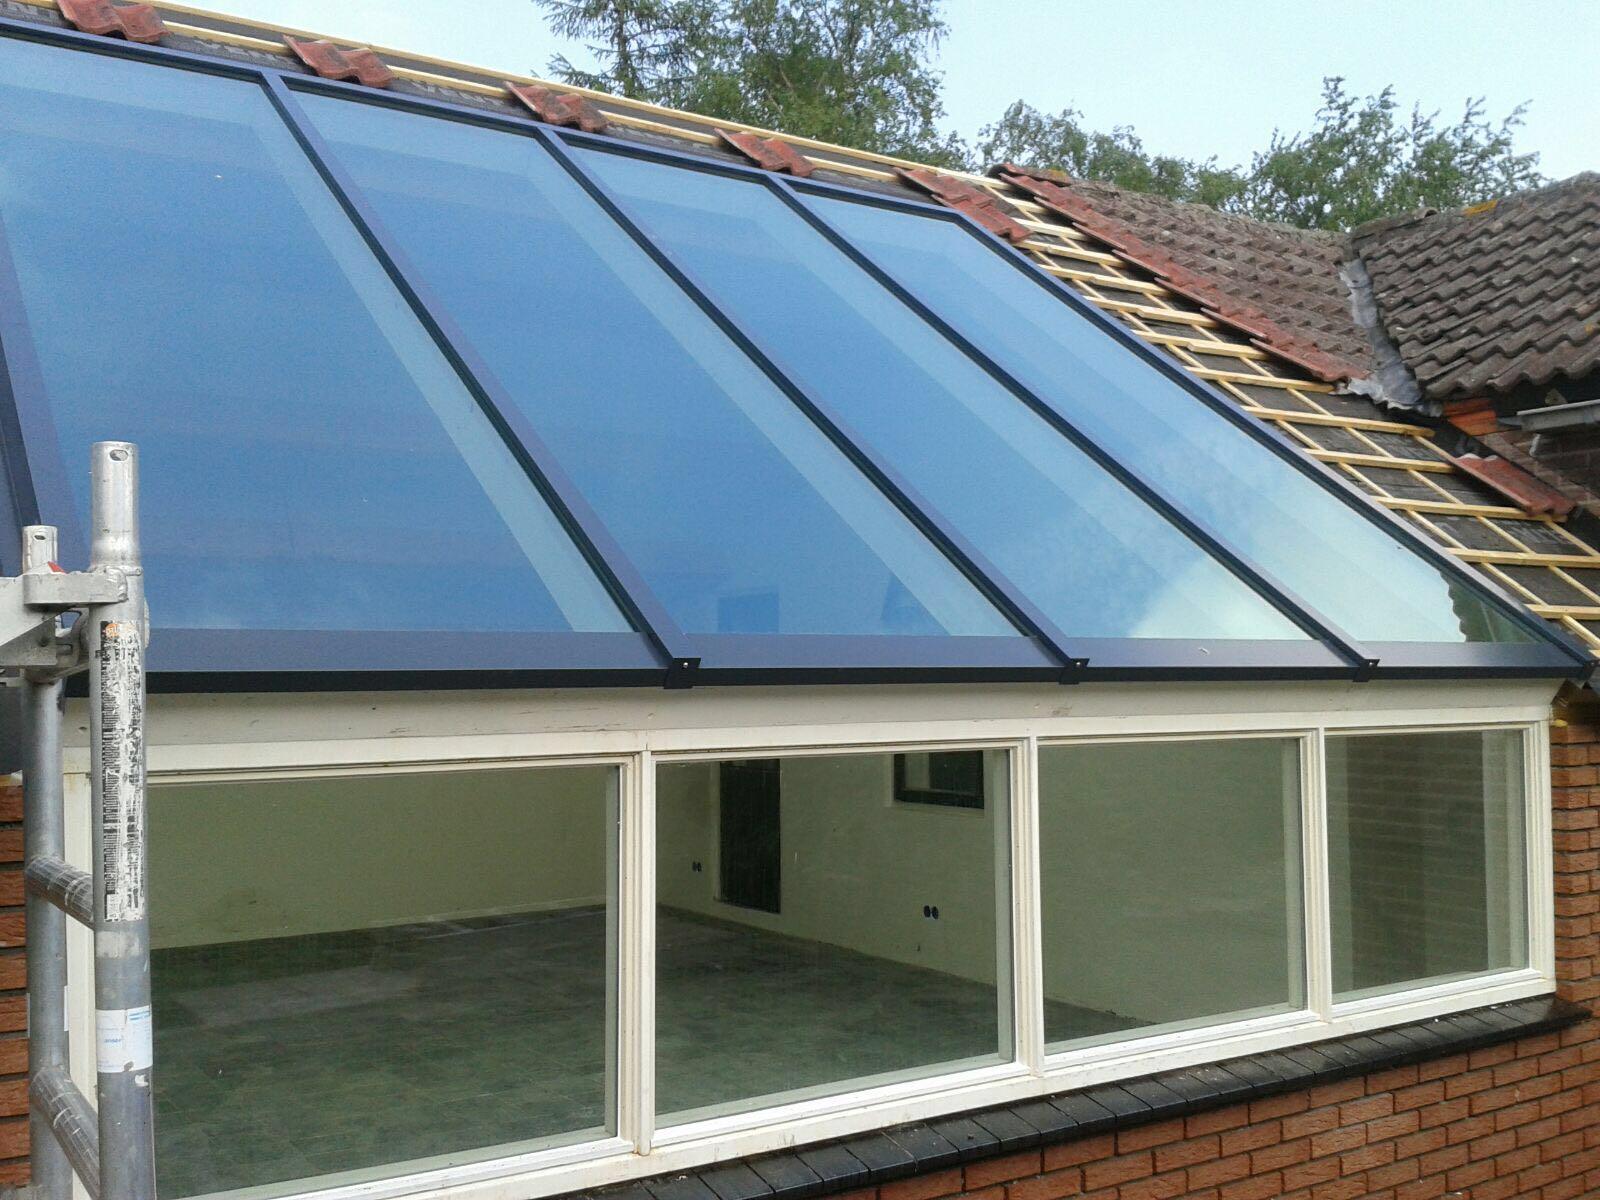 Glazen dak met glasprofielen xl glas en verf - Glazen dak dak glijdende ...